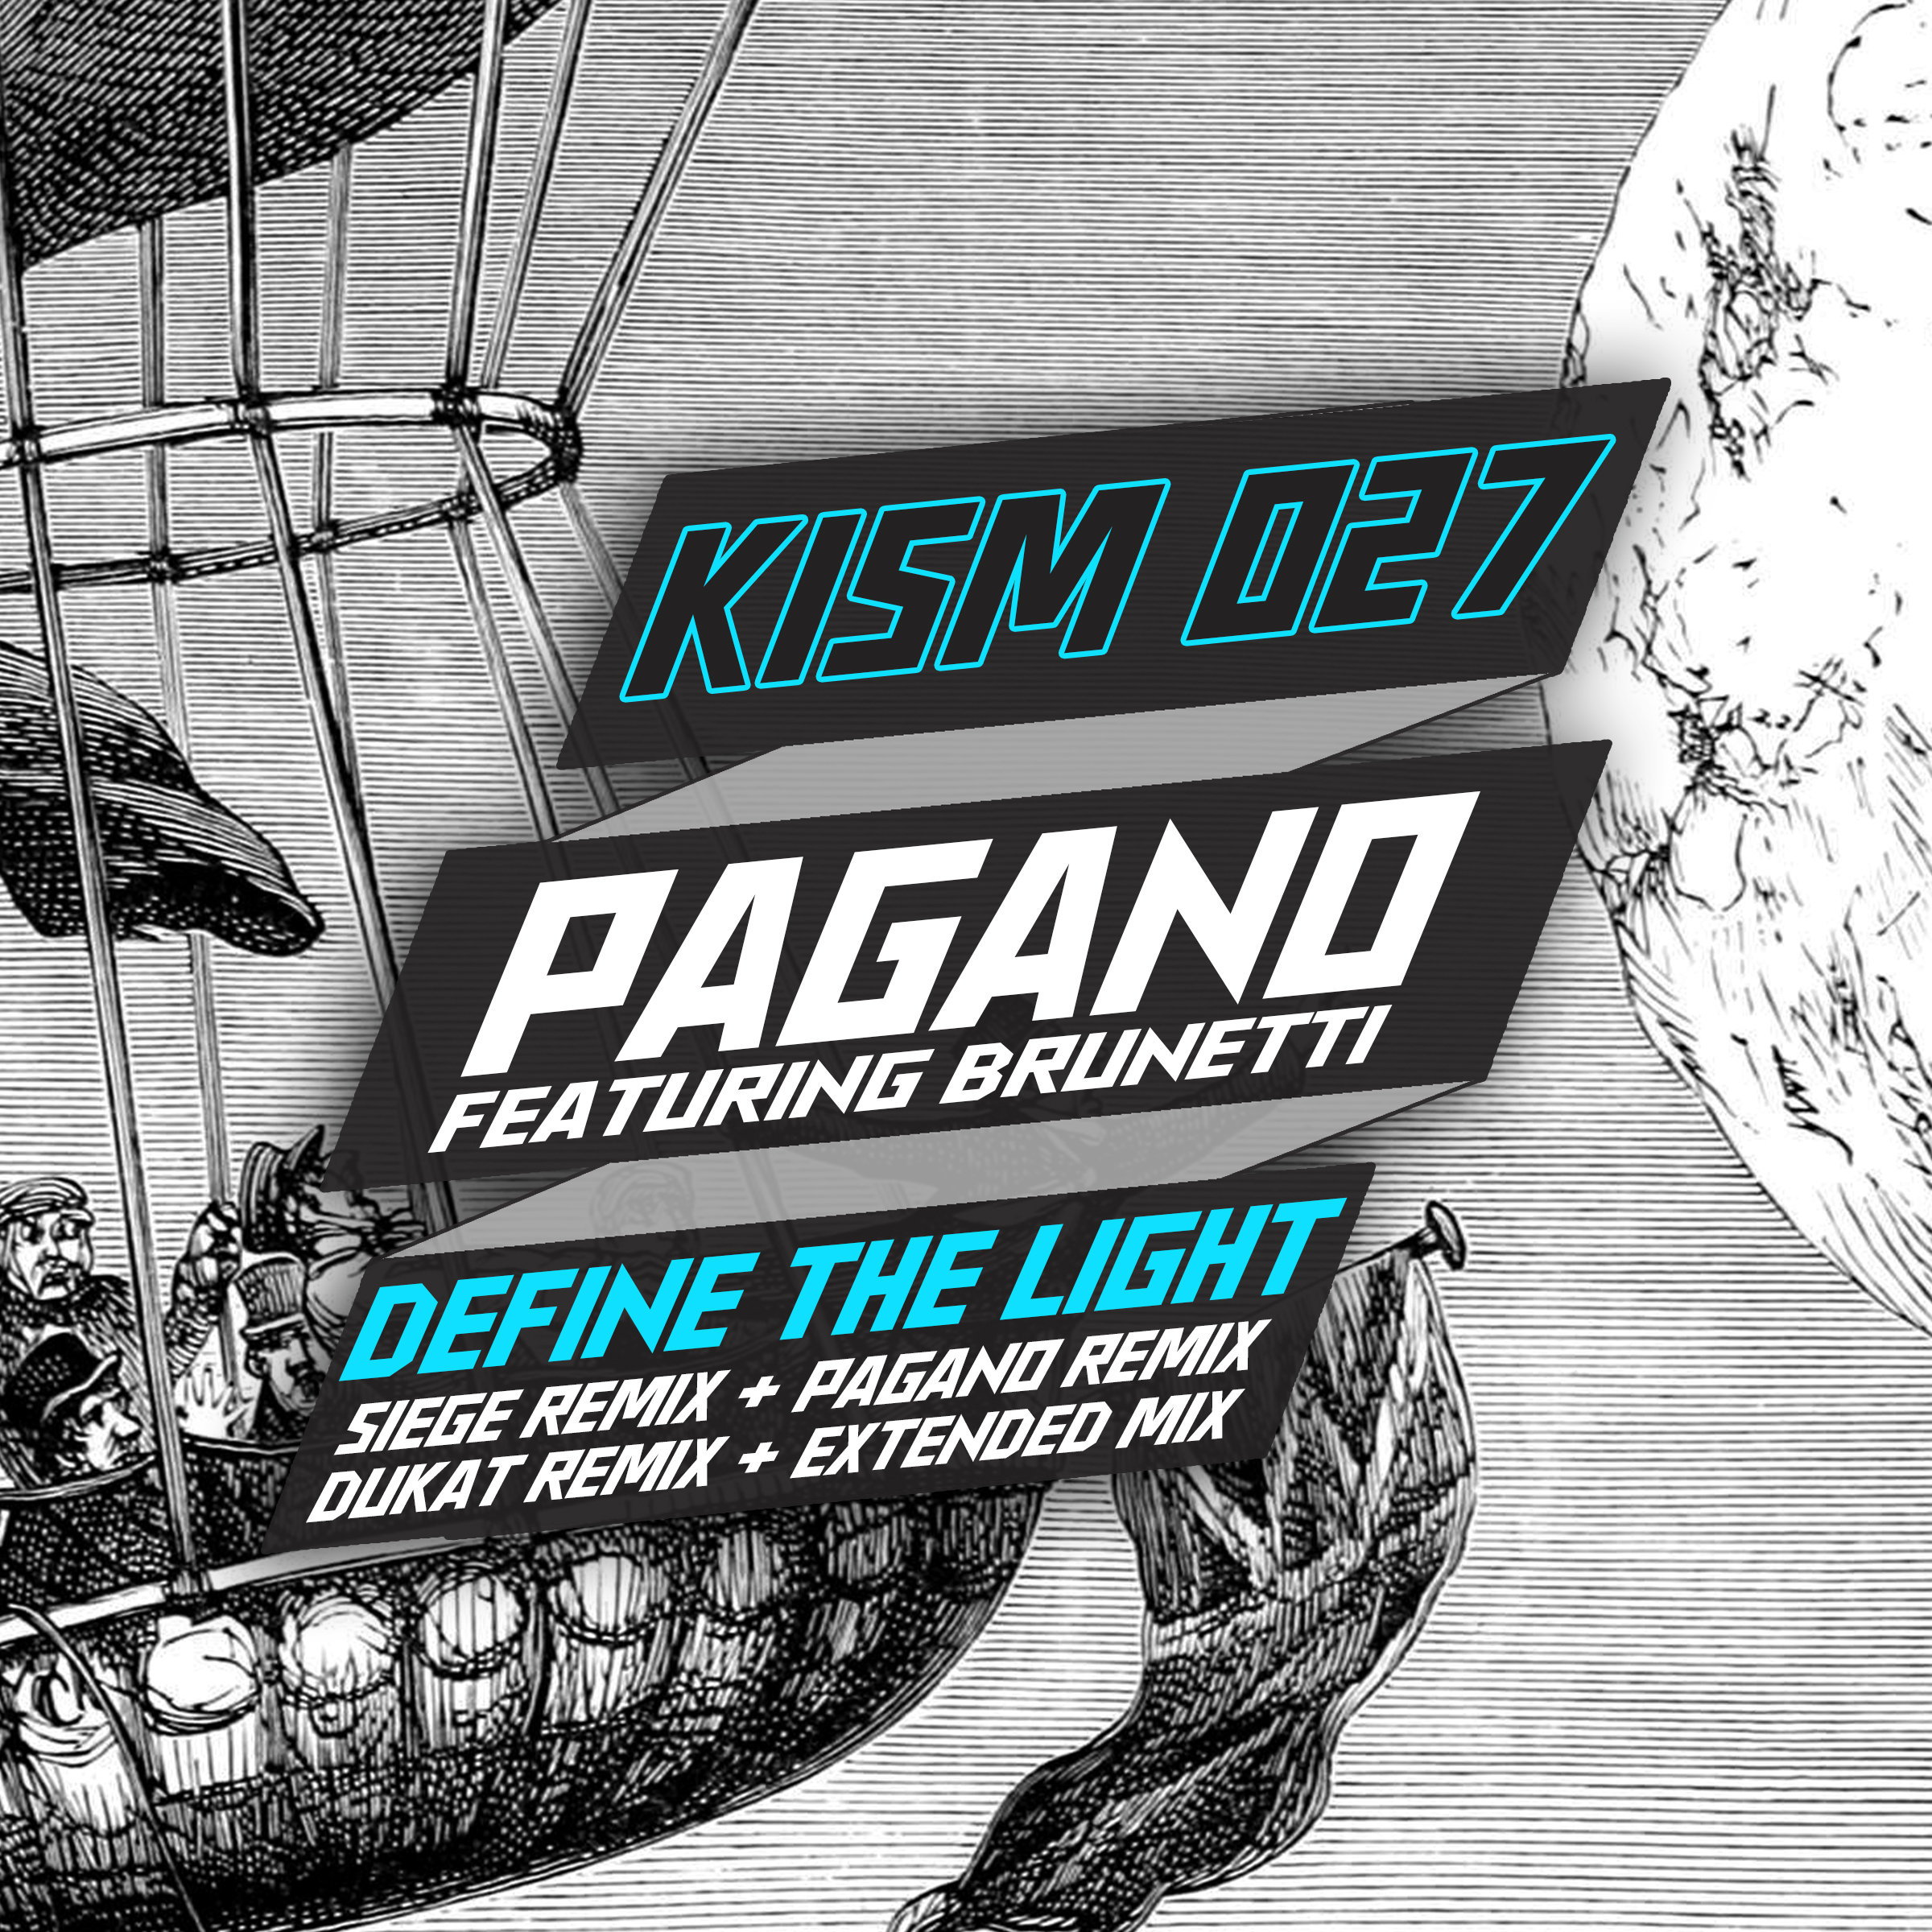 Pagano Define The Light Remix EP